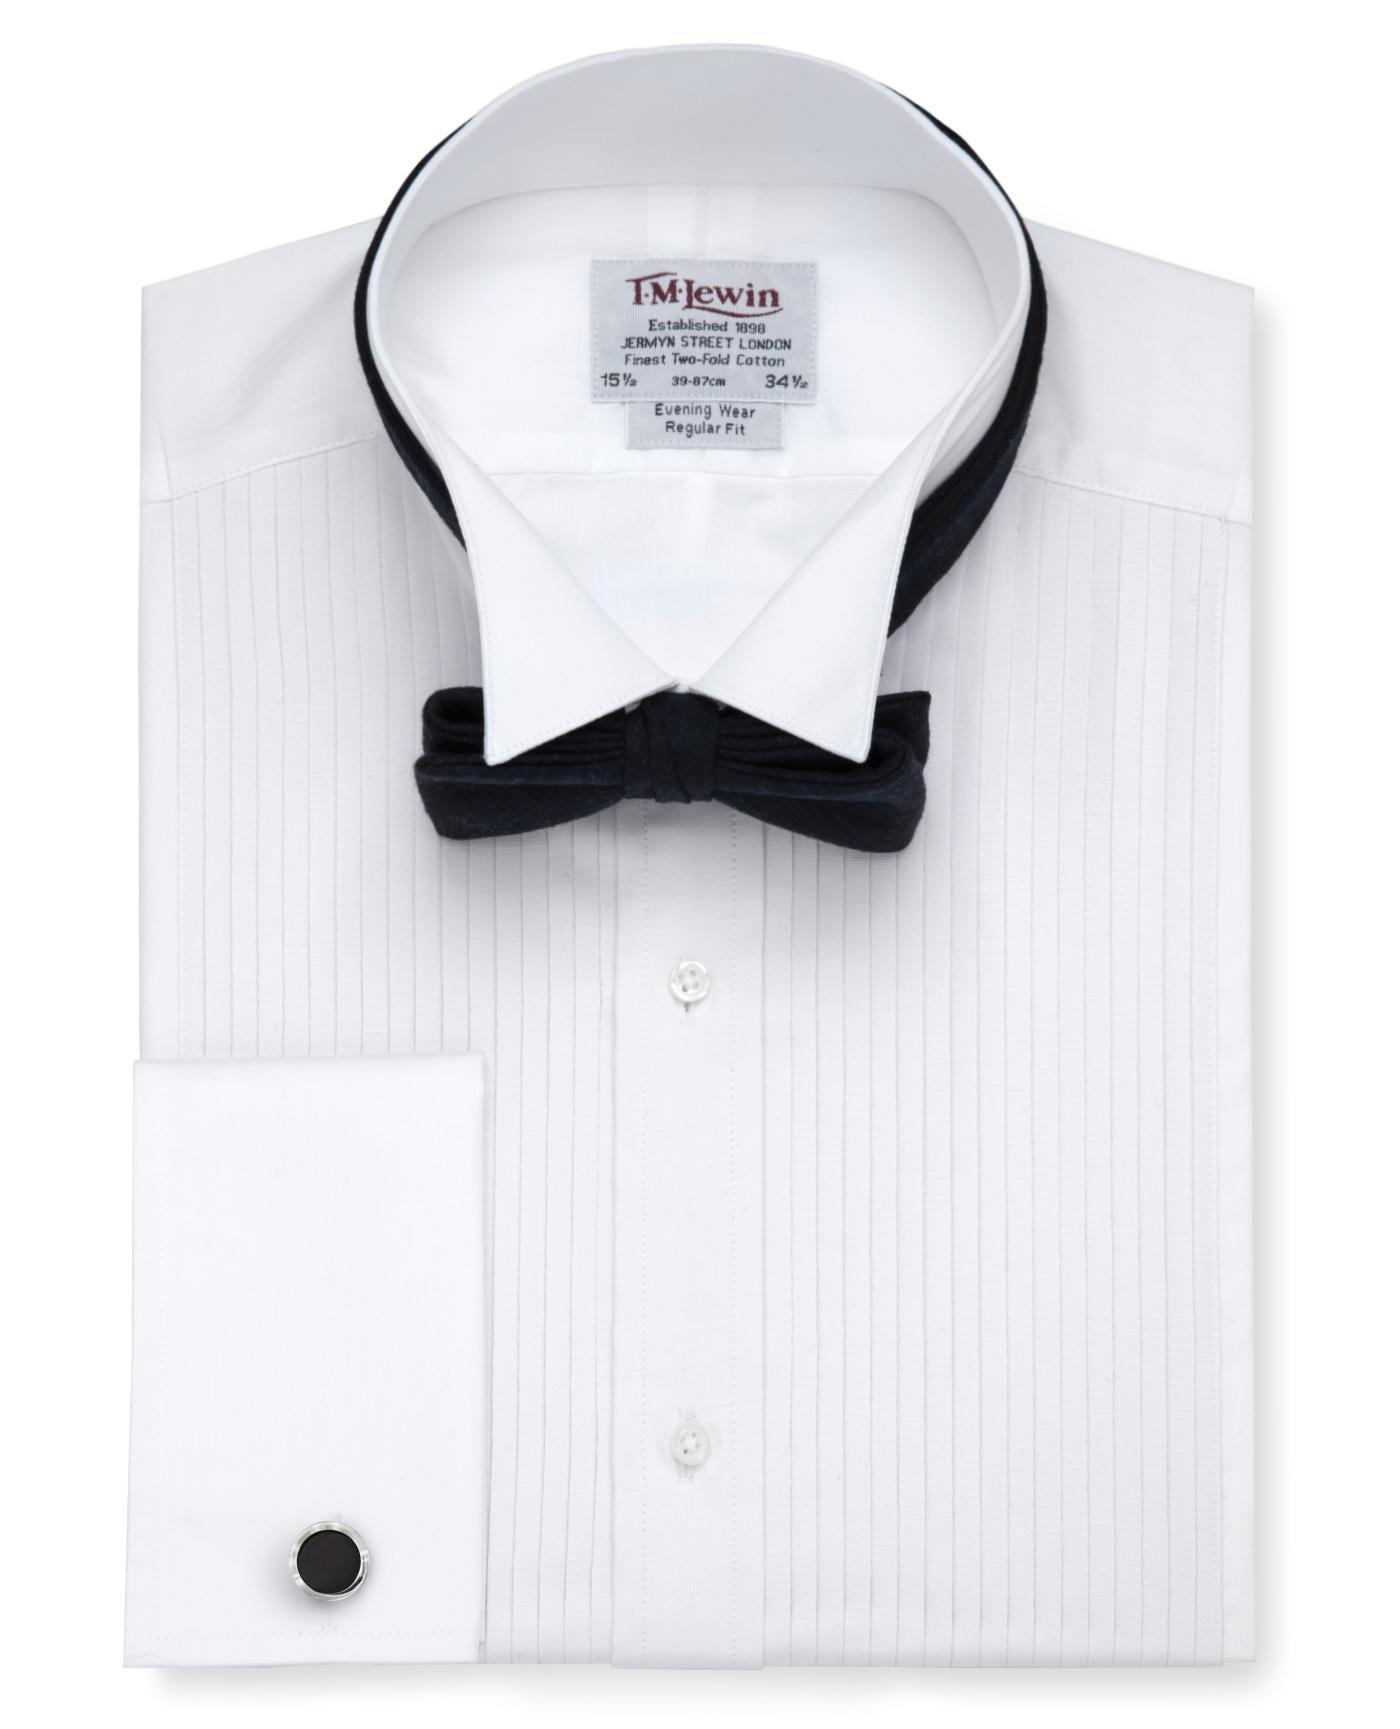 Pleated Wing Collar Regular Fit Evening Dress Shirt Reviews Tm